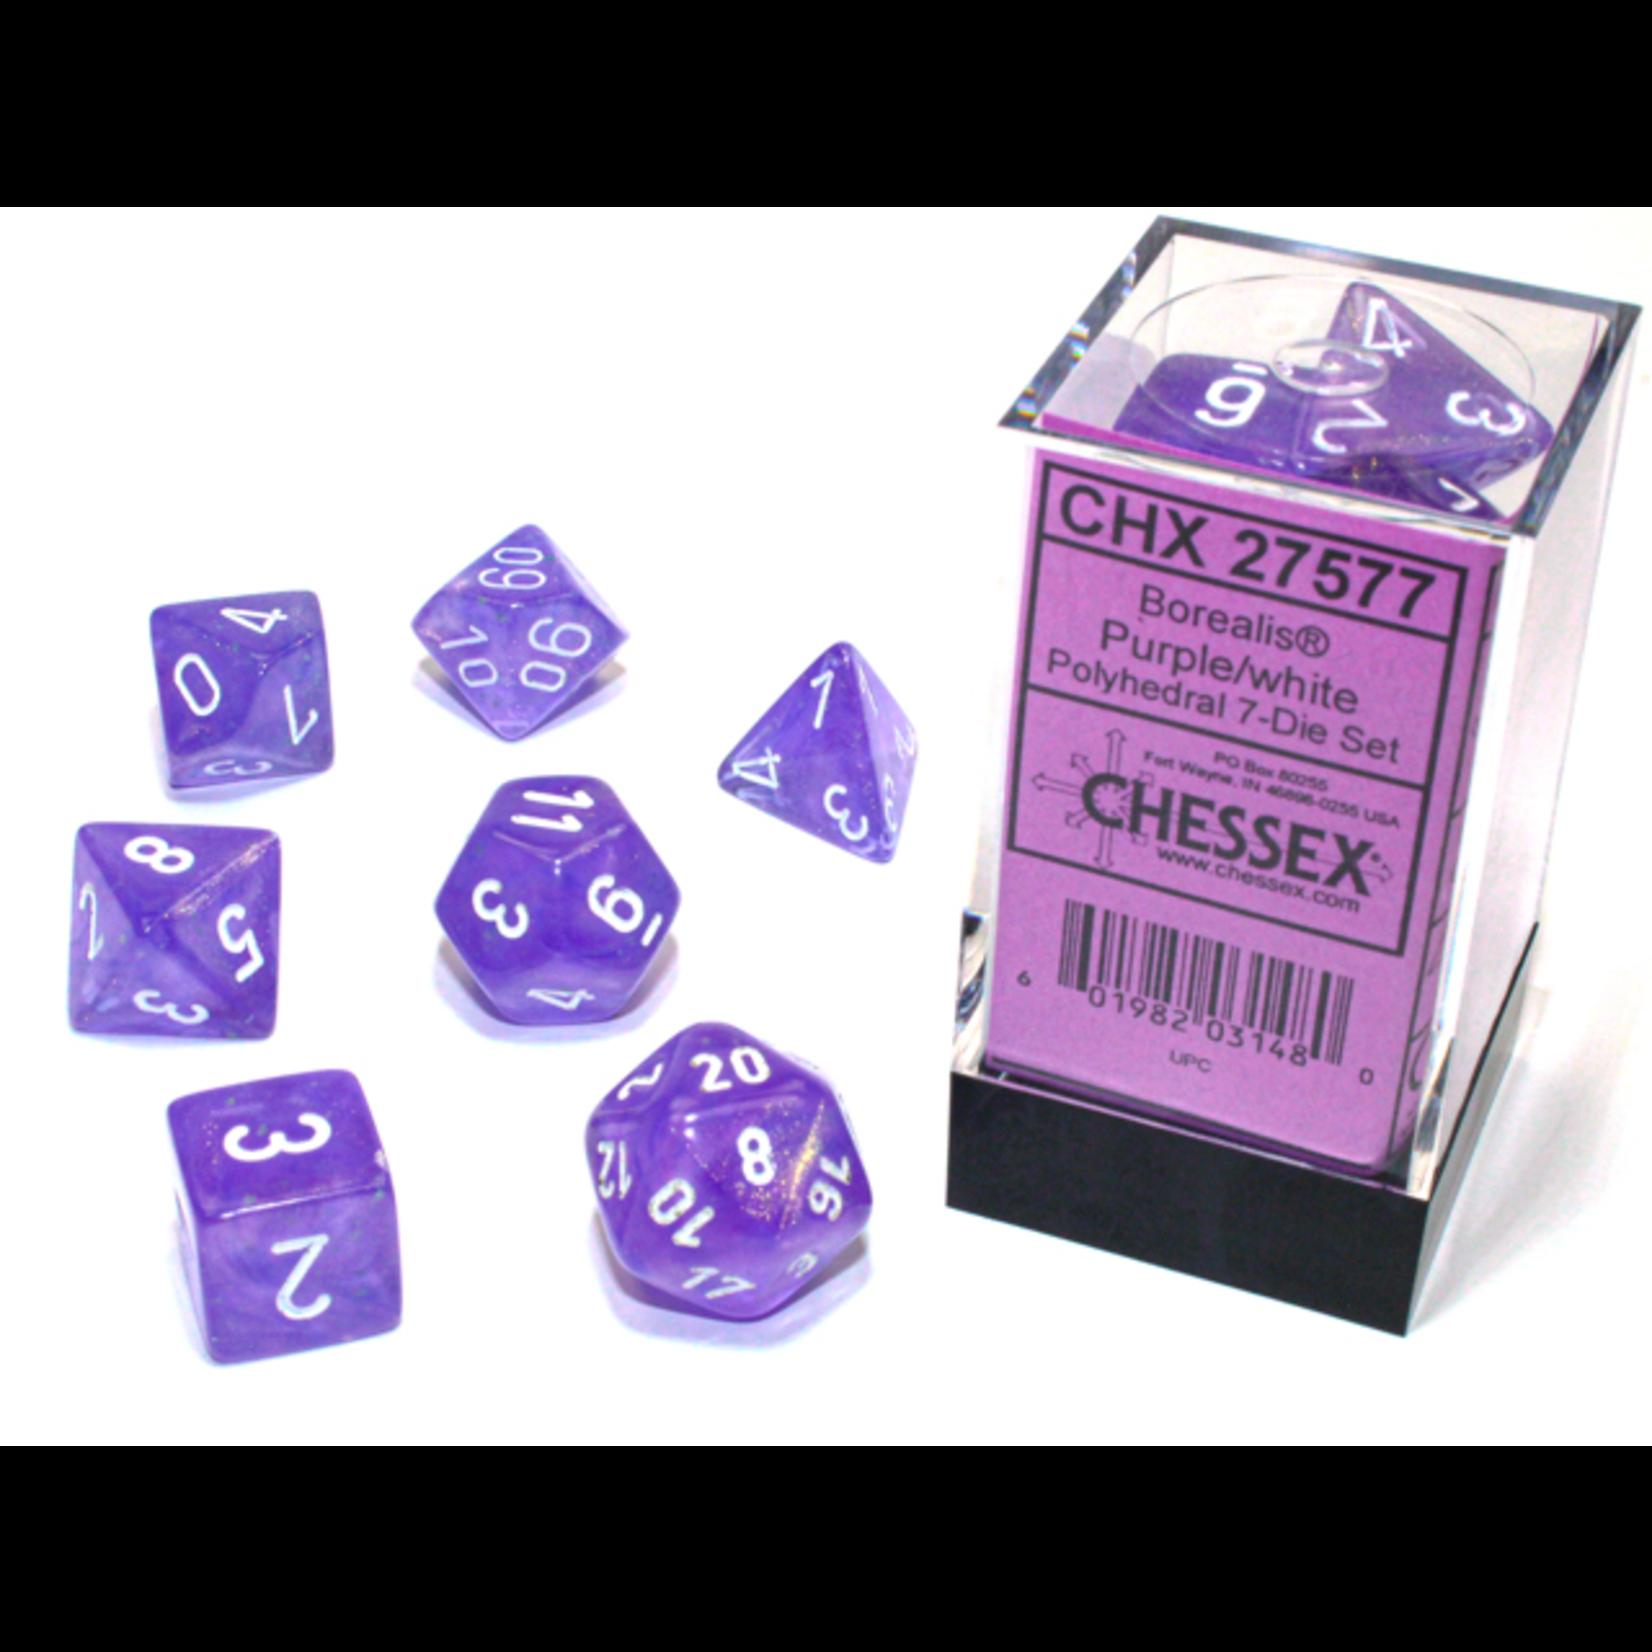 Chessex Dice: 7-Set Borealis Luminary Purple with White